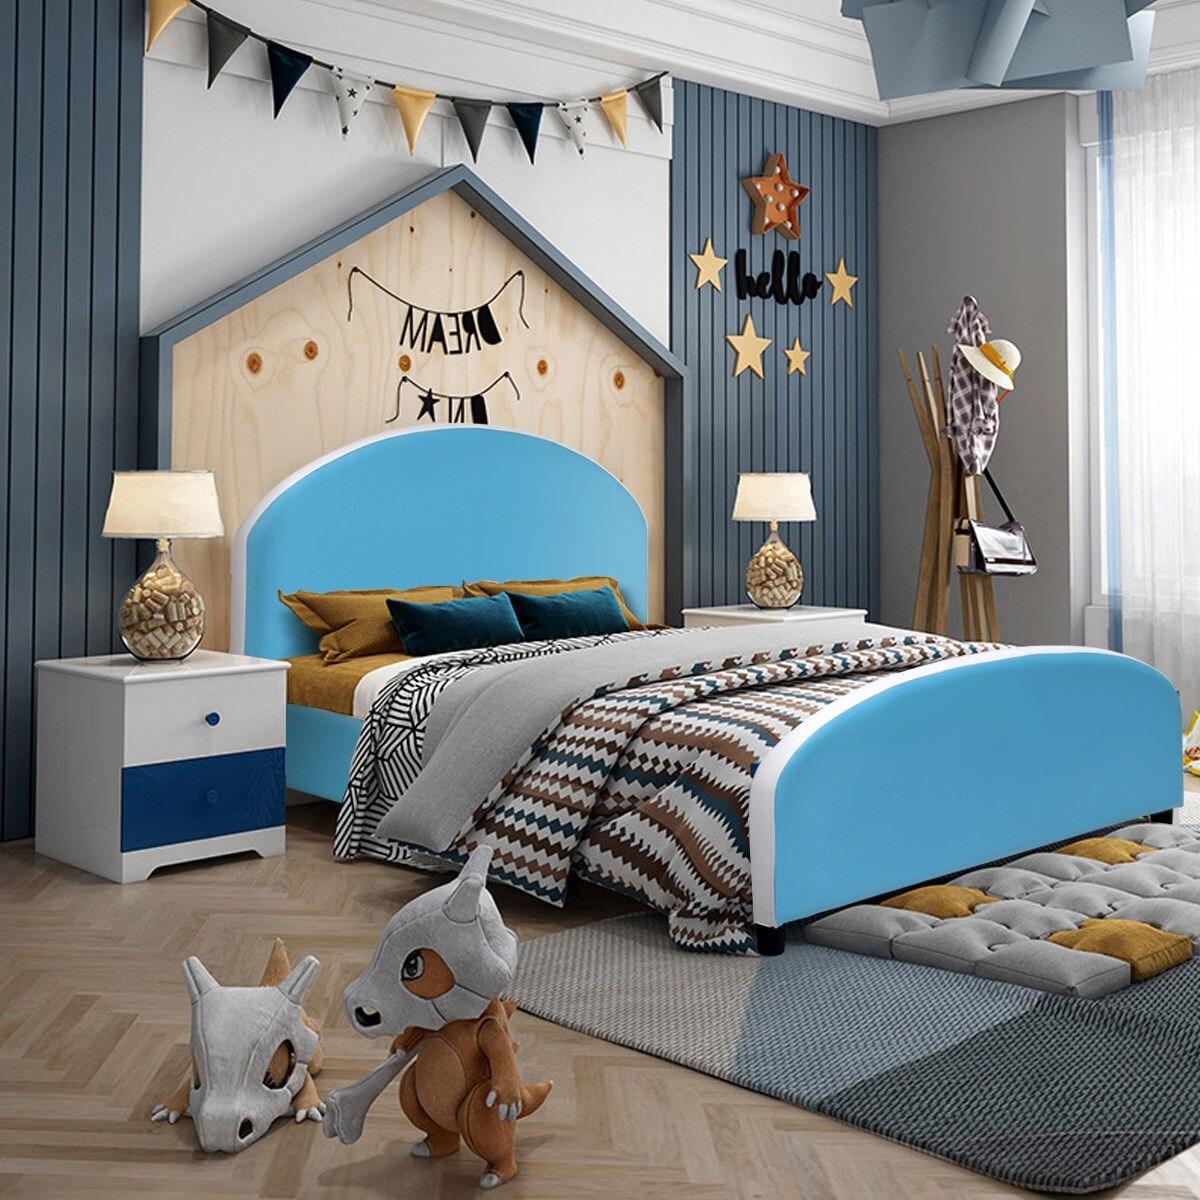 Costway Kids Children Pu Upholstered Platform Wooden Bed Bedroom Furniture Blue Overstock 23081806